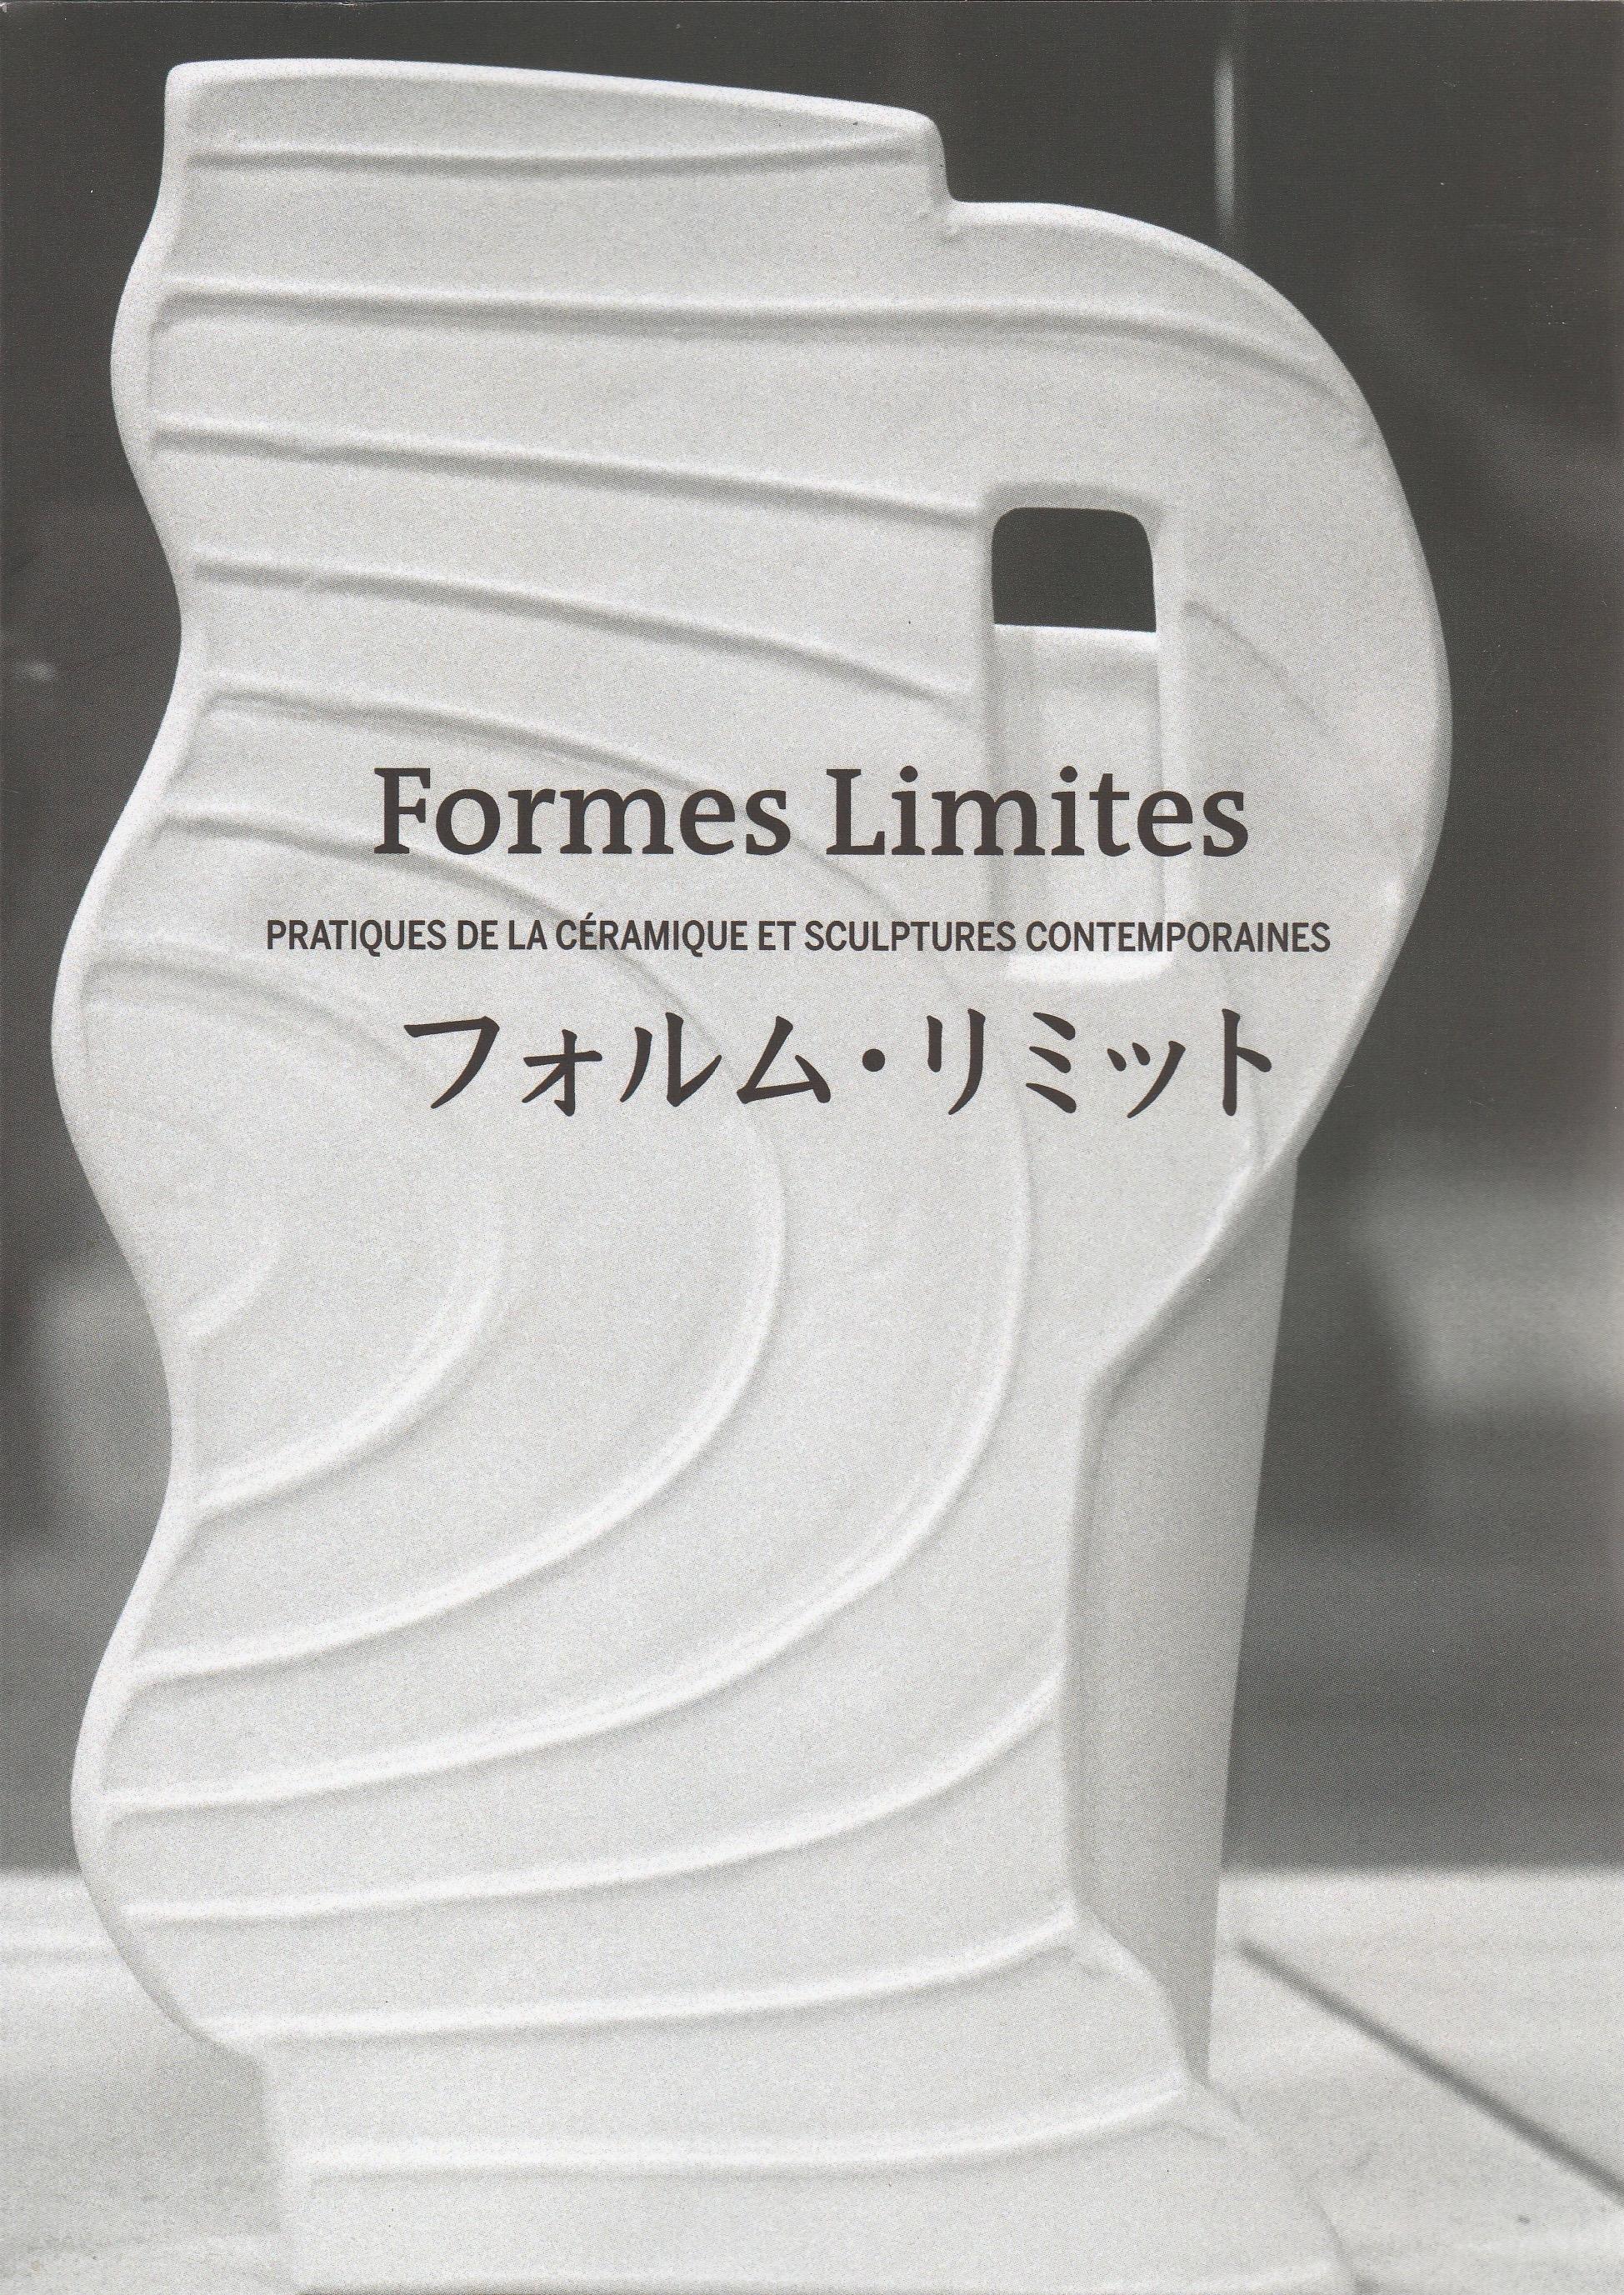 catalogue_formes_limites_1_2_(1).jpg